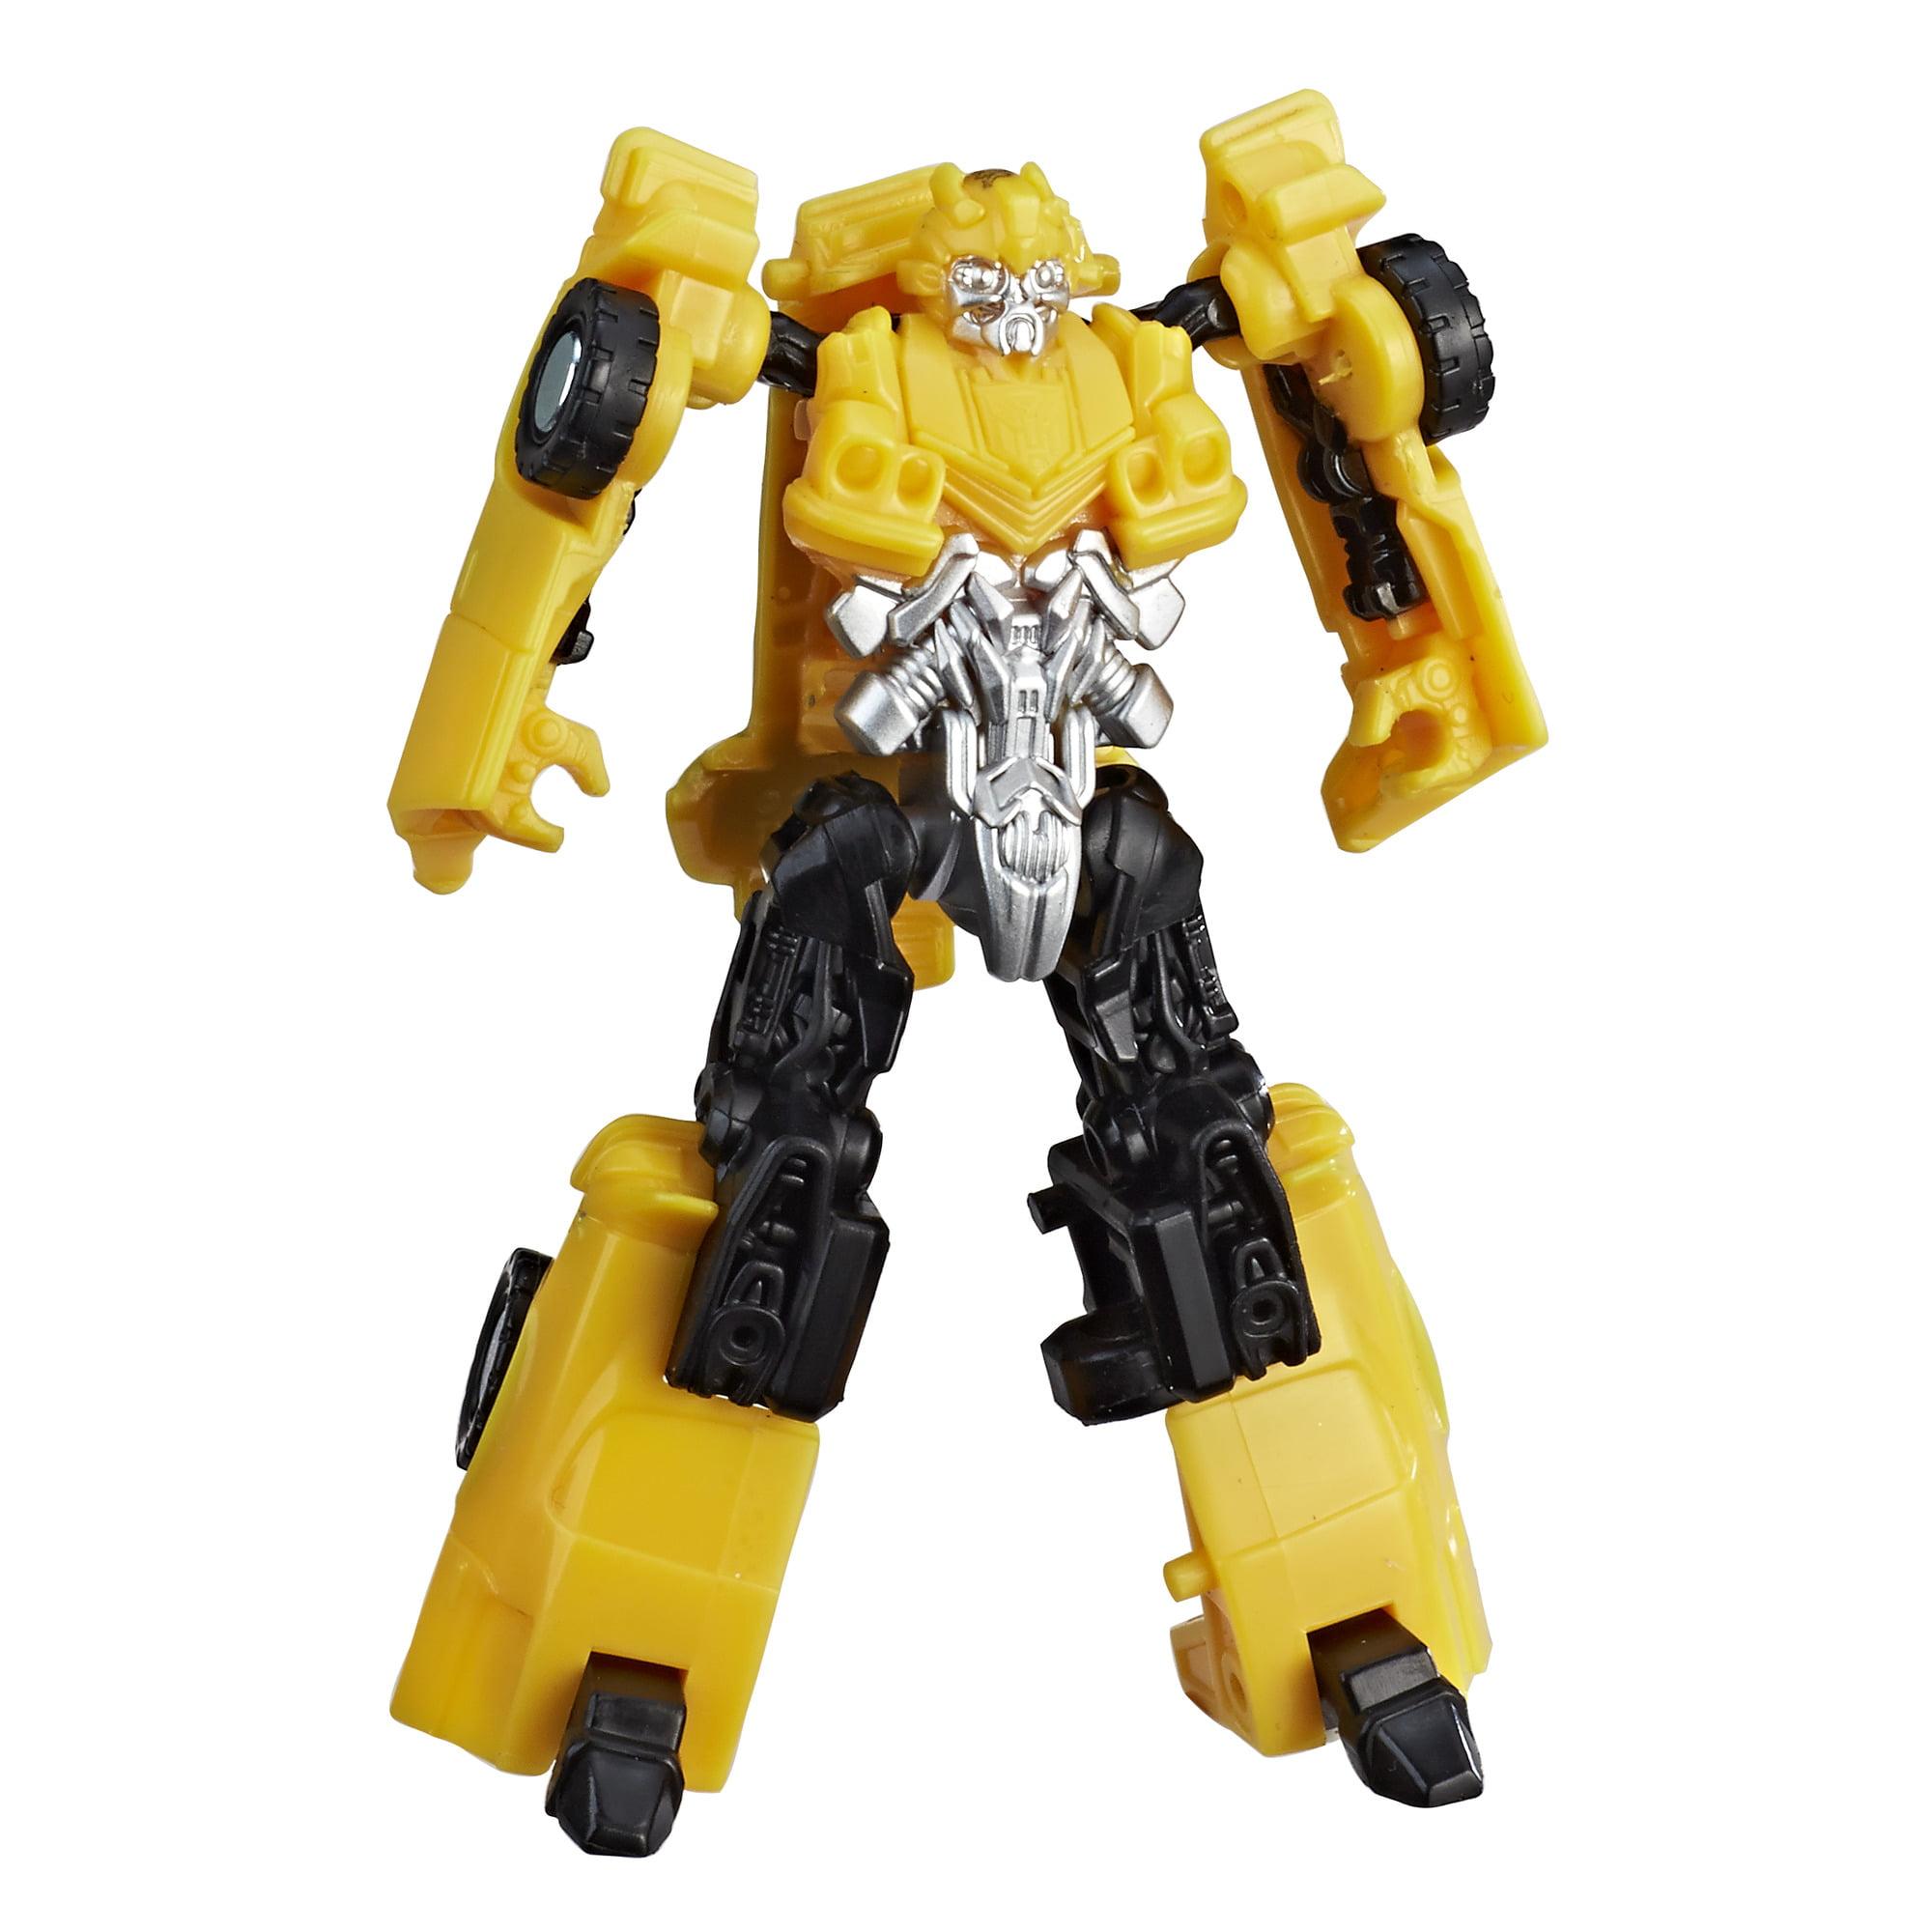 Transformers Bumblebee - Energon Igniters Speed Series Bumblebee